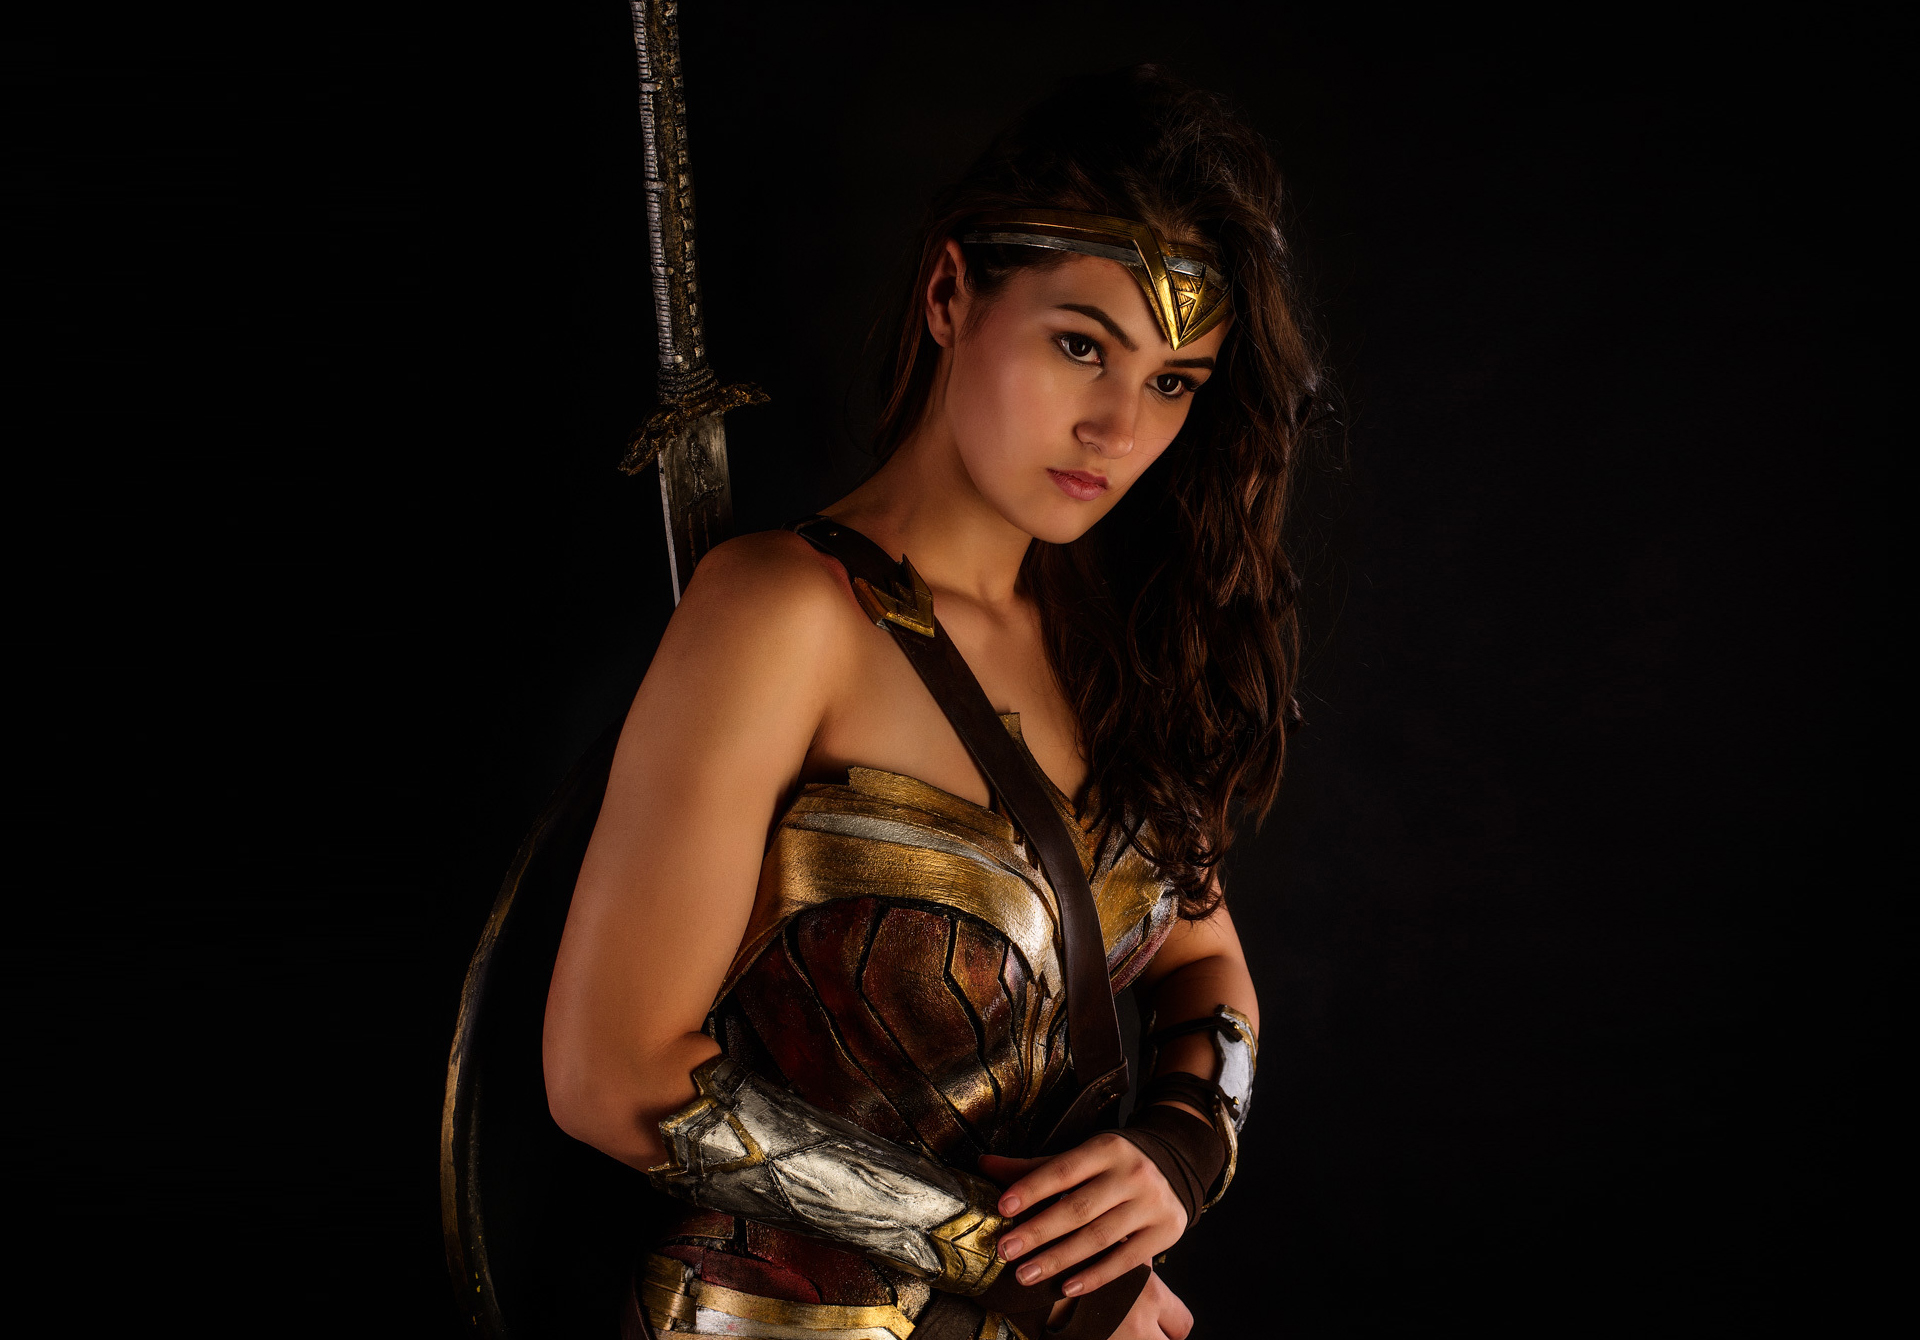 Wonder Woman Movie Wallpaper 1: Cosplay Wonder Woman, HD Movies, 4k Wallpapers, Images